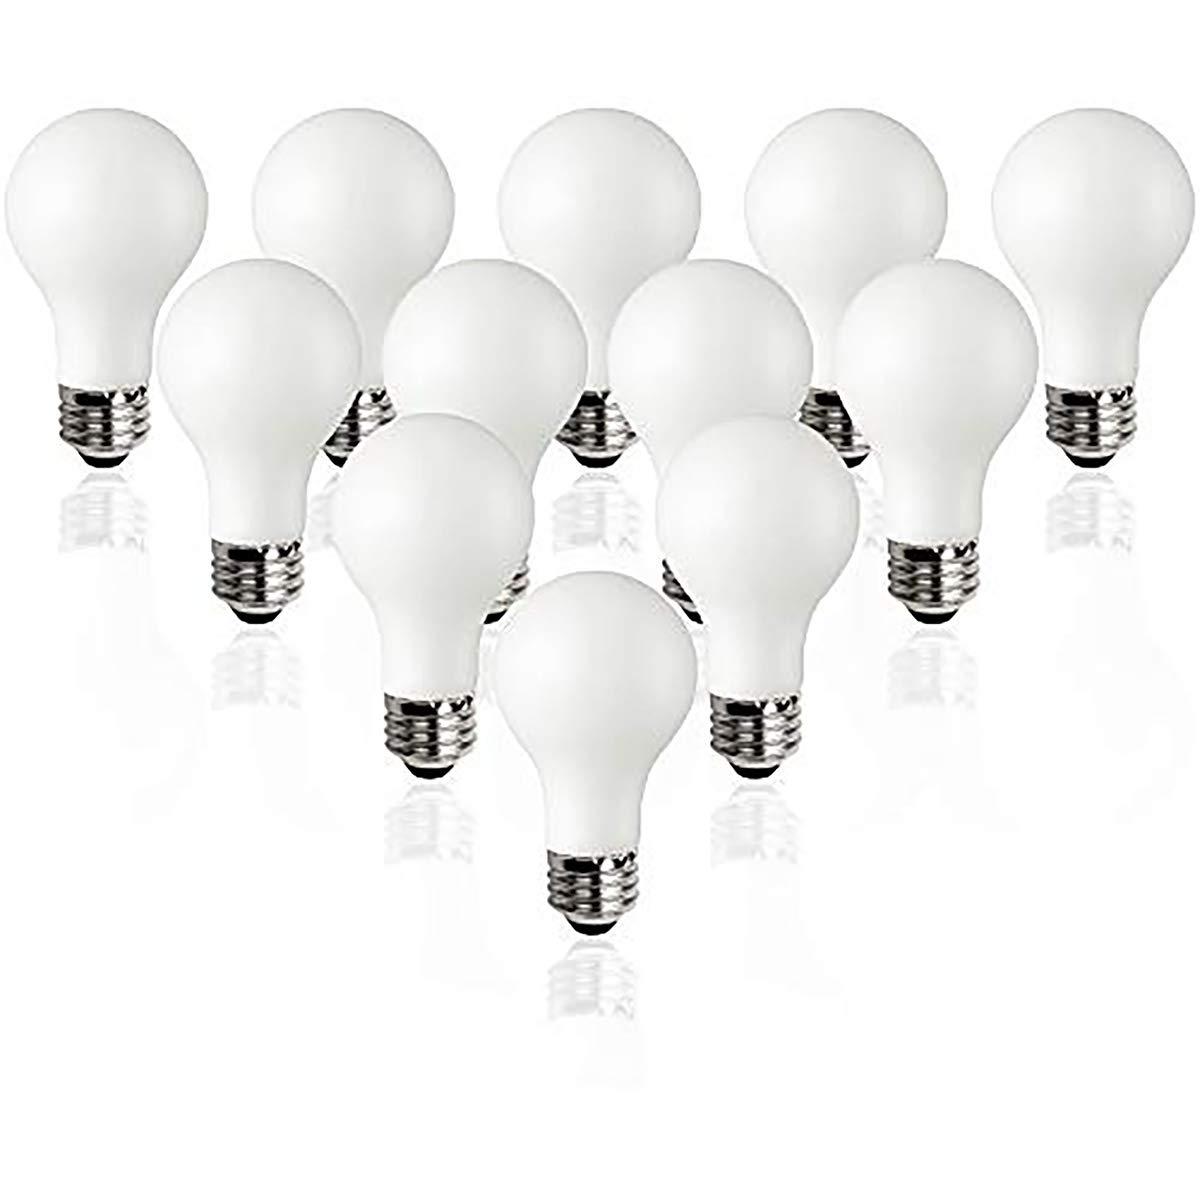 TCP Classic LED 60 Watt A19, 12 Pack, Energy Star, Daylight (5000K) Dimmable Light Bulbs